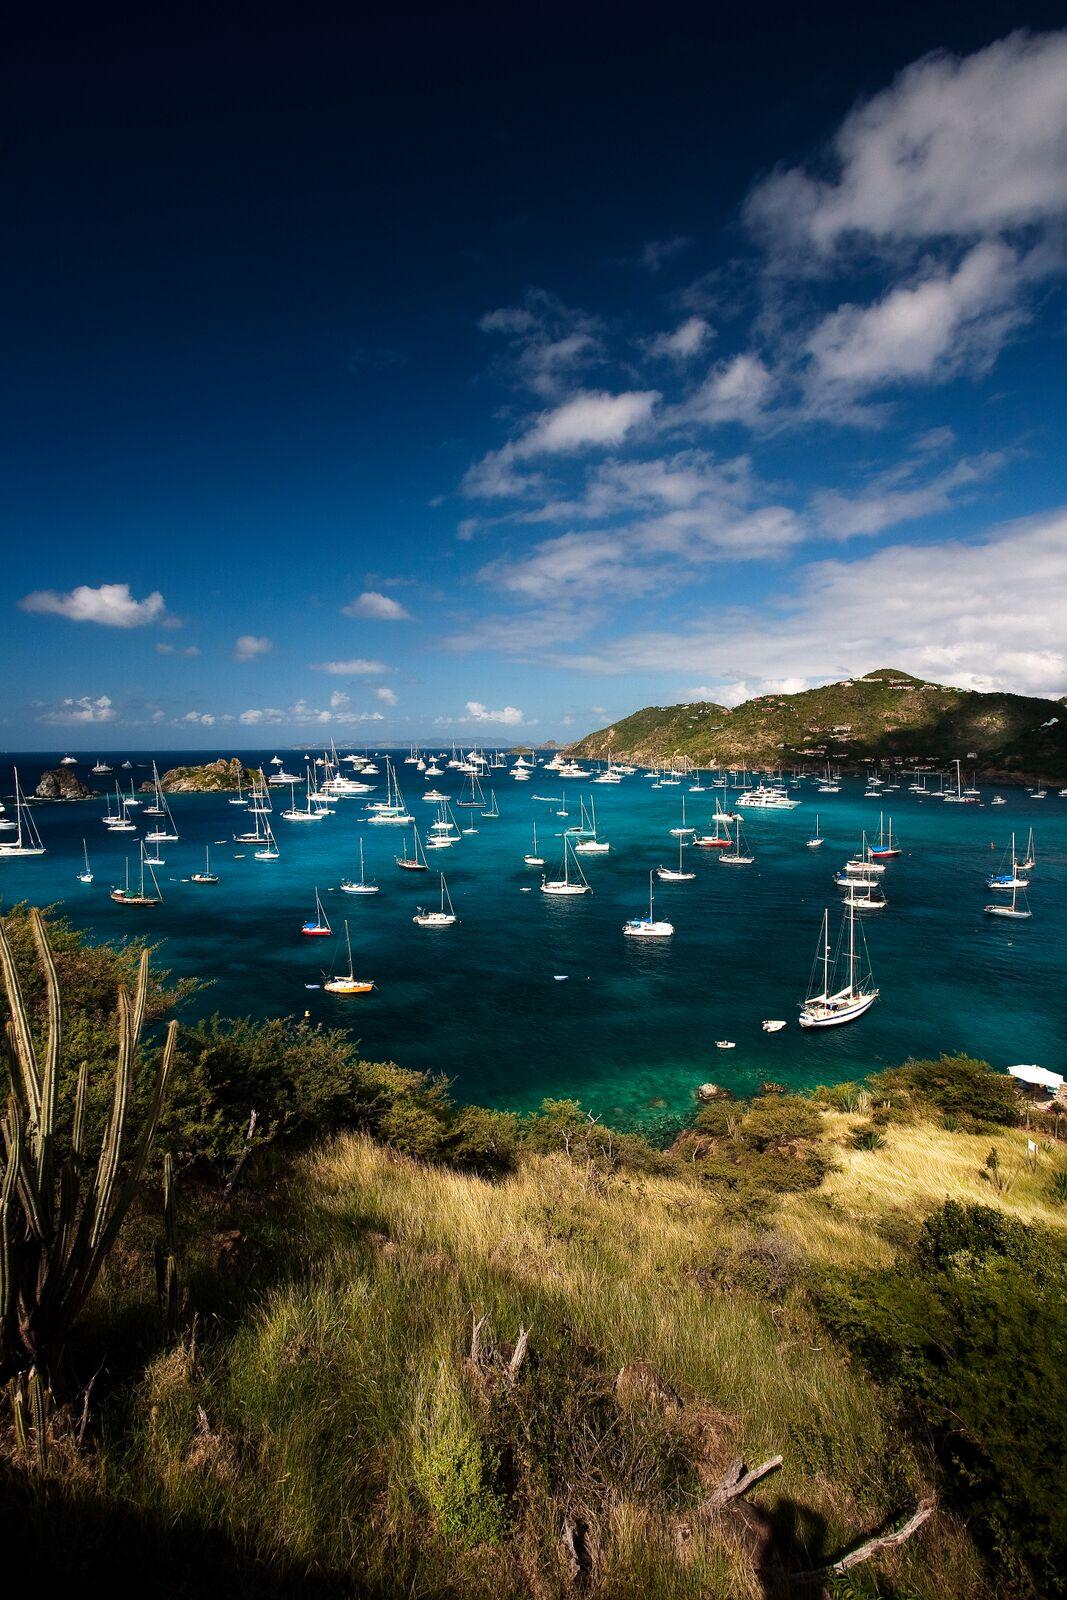 St Barts a clean green island